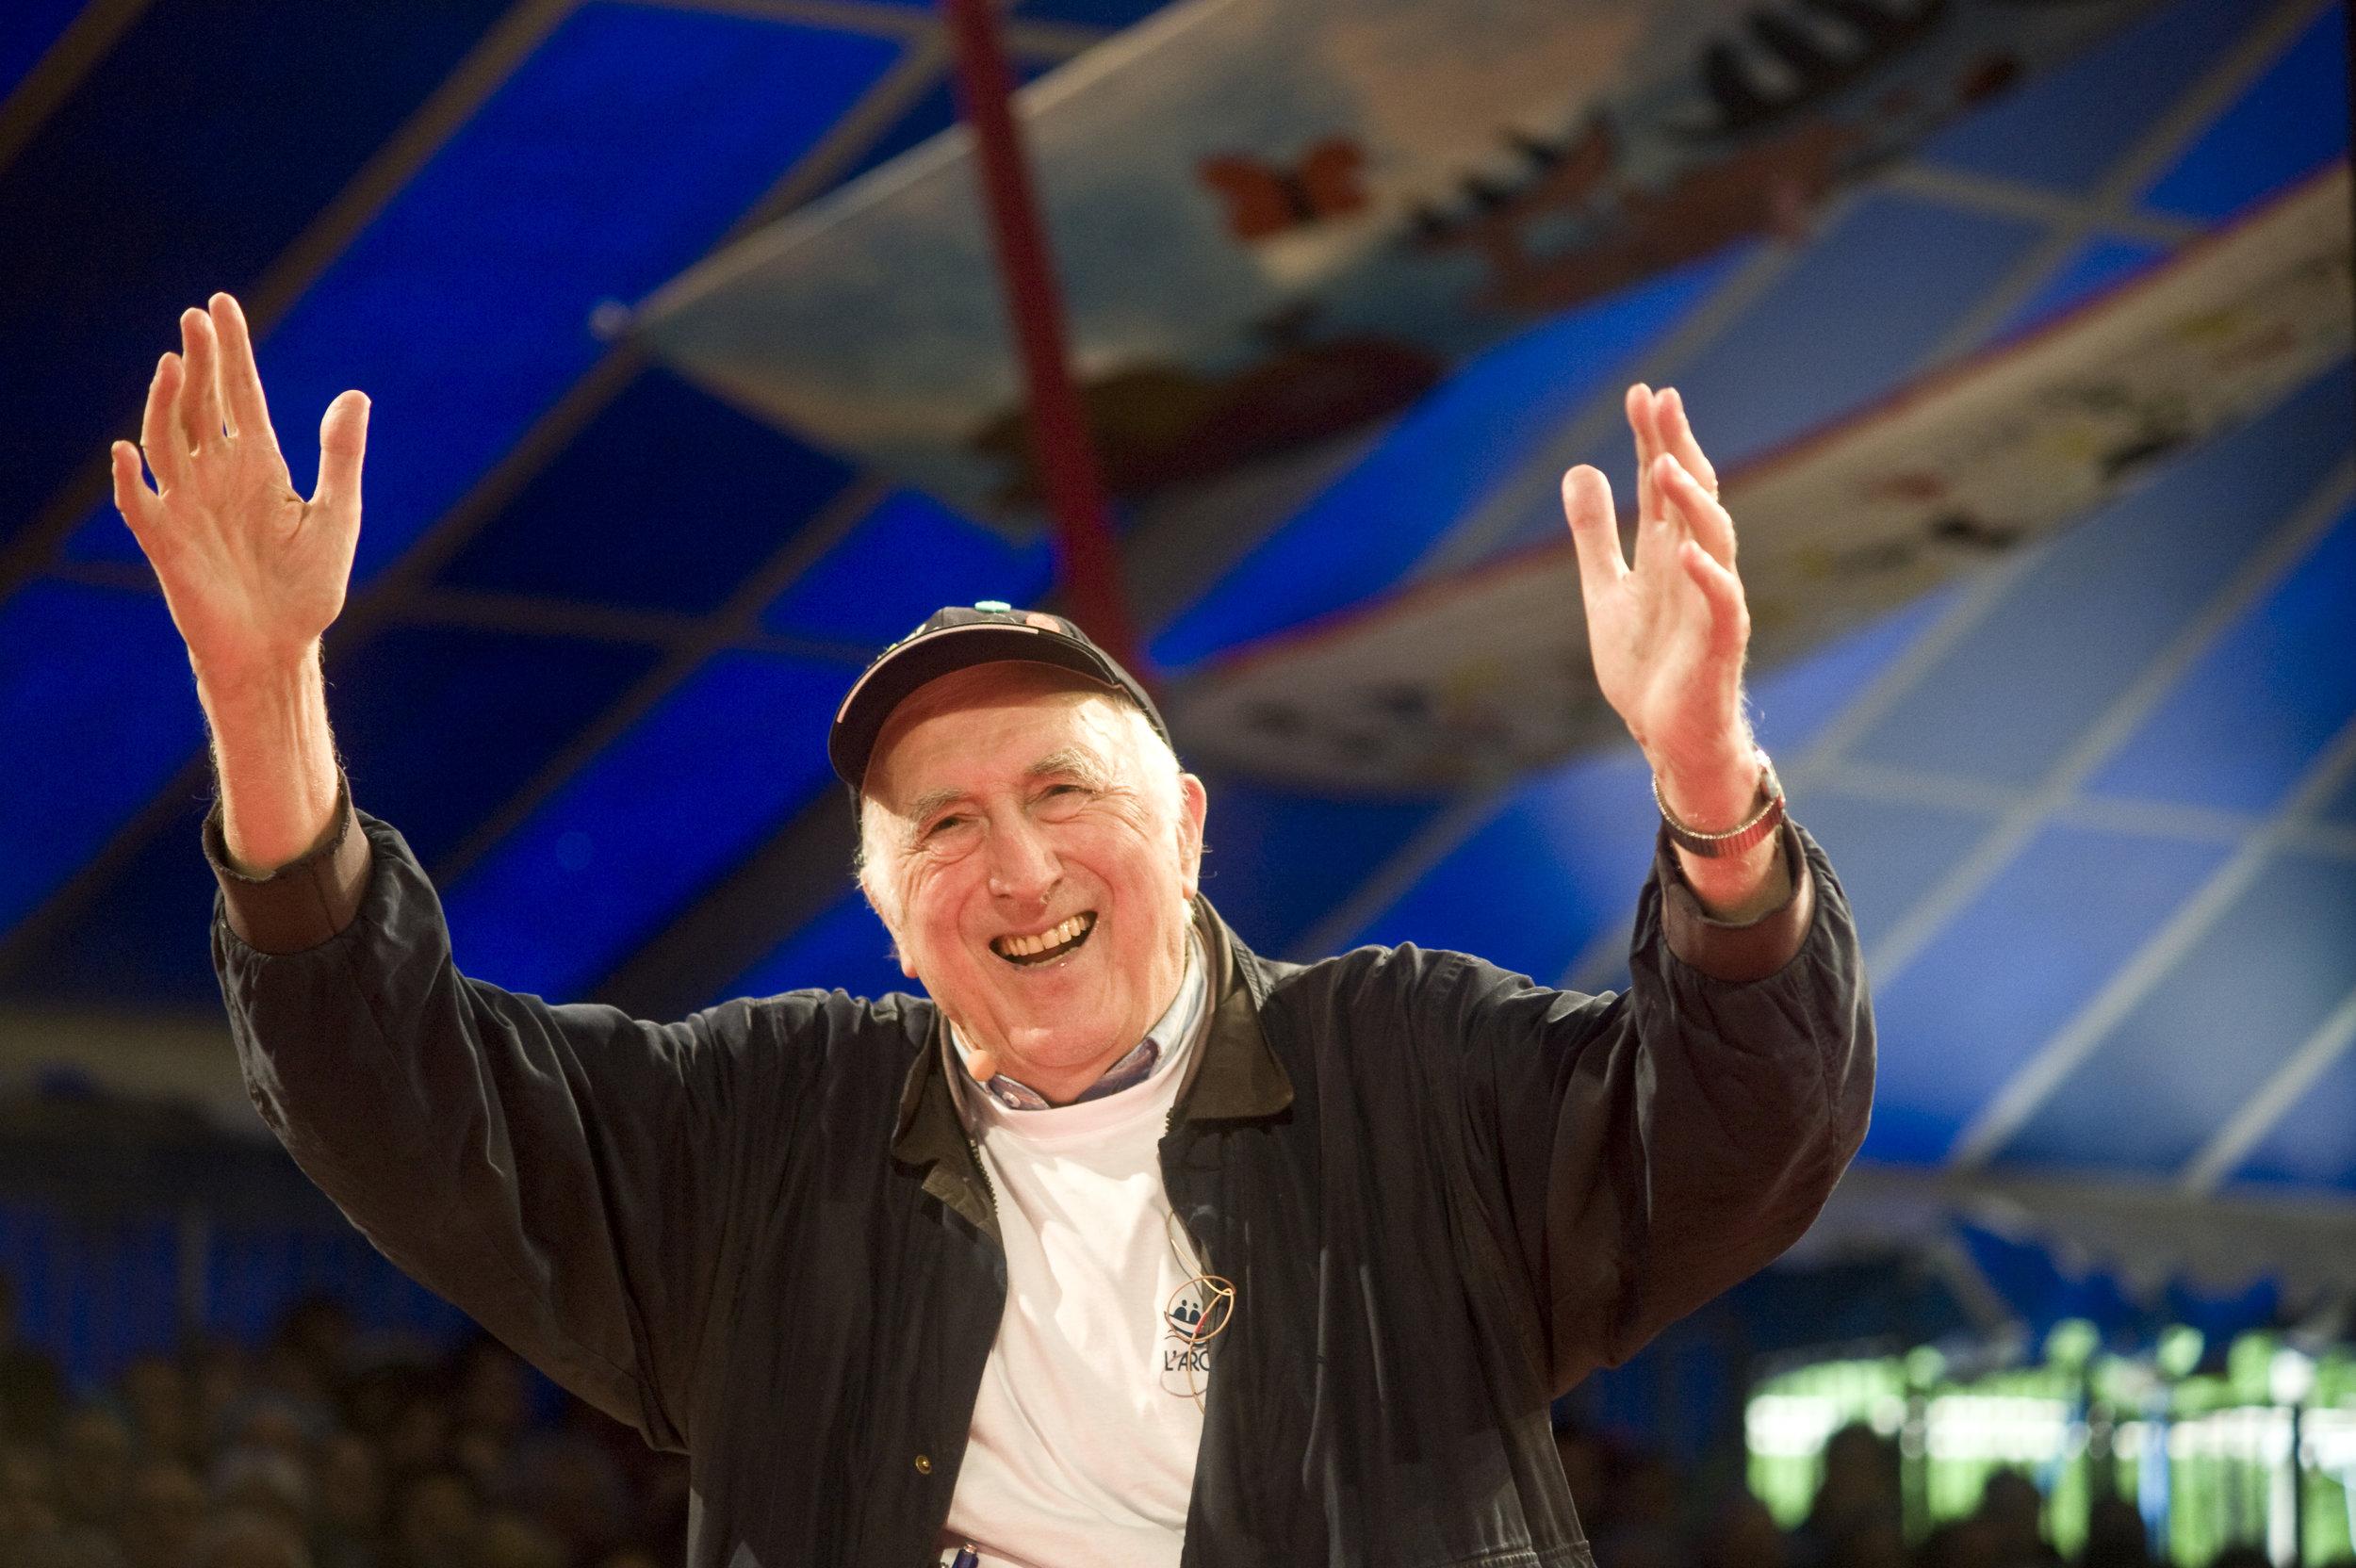 Jean Vanier at L'arche 50th Anniversary Celebrations, Paray-le-Monial, France © Kayte Brimacombe